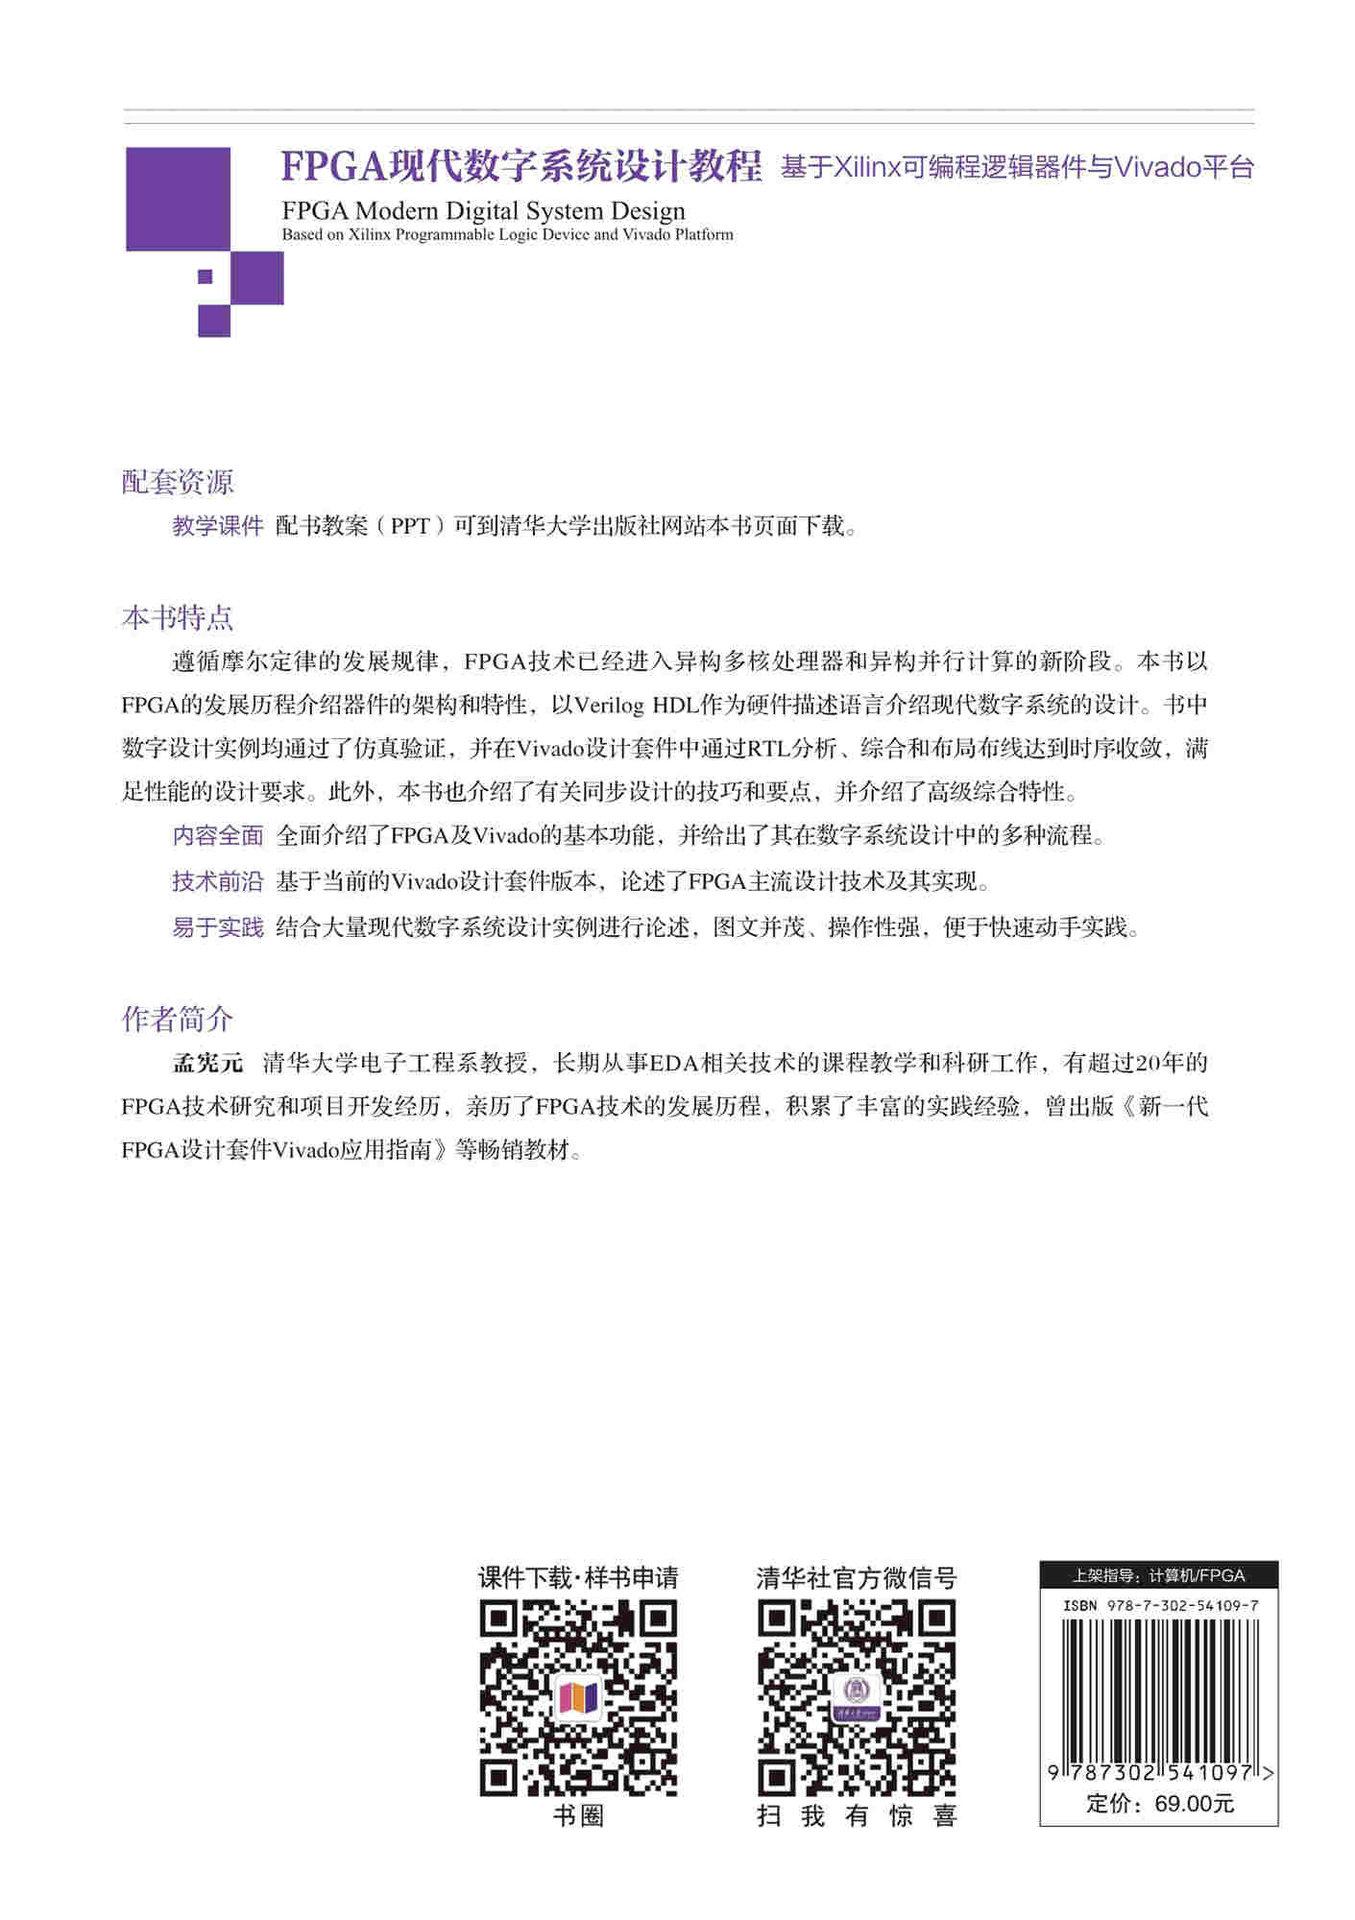 FPGA 現代數字系統設計教程 — 基於 Xilinx 可編程邏輯器件與 Vivado 平臺-preview-2